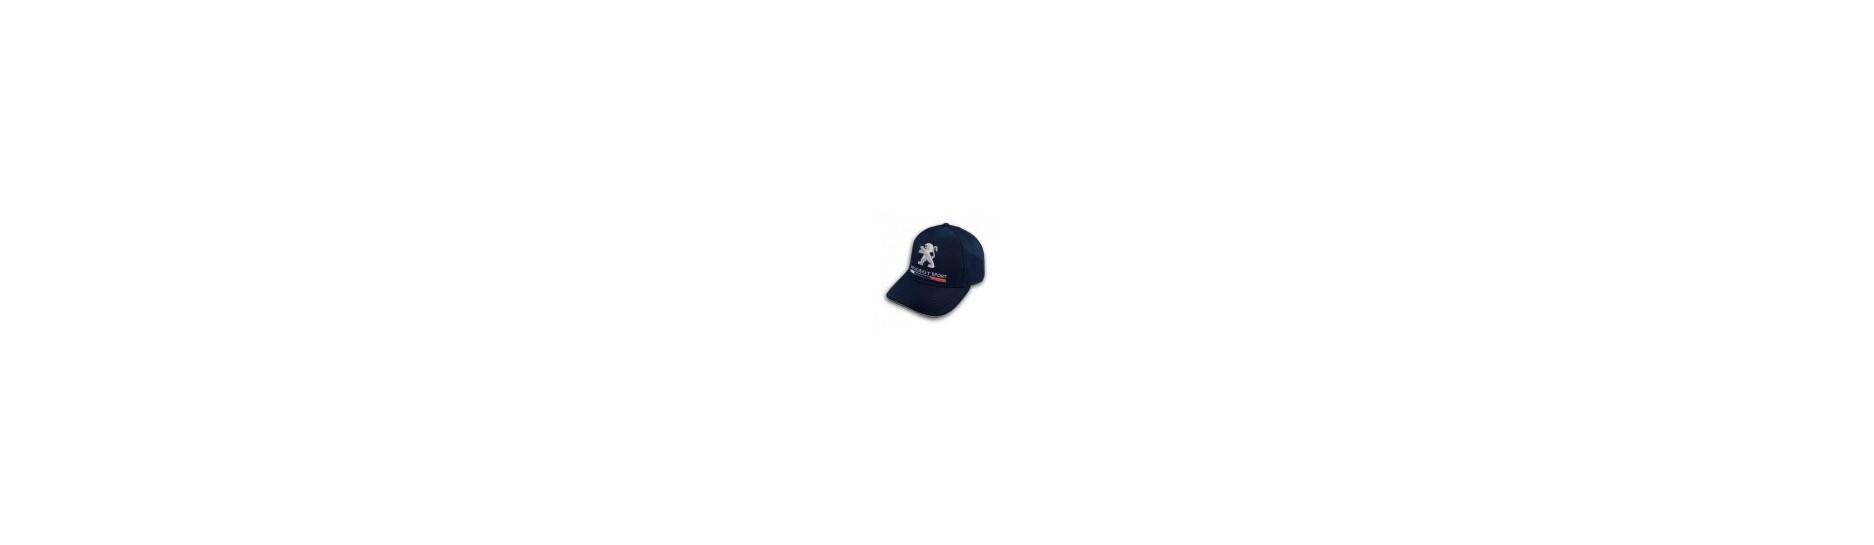 Peugeot Kappe und Mütze